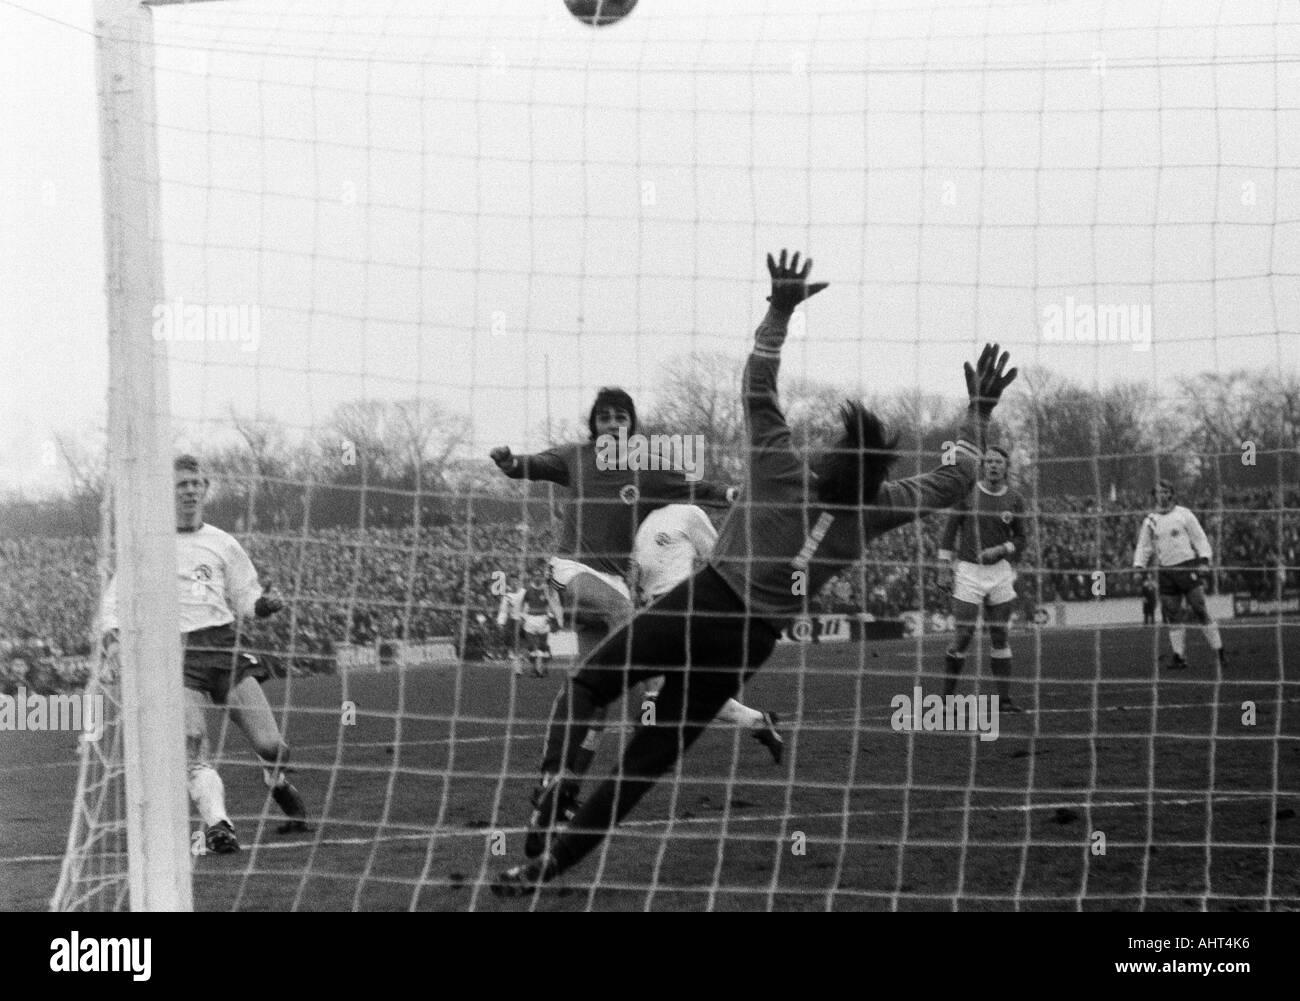 football, Bundesliga, 1970/1971, Niederrhein Stadium, Rot-Weiss Oberhausen versus Rot-Weiss Essen 0:0, scene of the match, f.l.t.r. Heinz Stauvermann (RWE), Hans Fritsche (RWO) shots on goal, keeper Fred Werner Bockholt (RWE), Lothar Kobluhn (RWO) - Stock Image